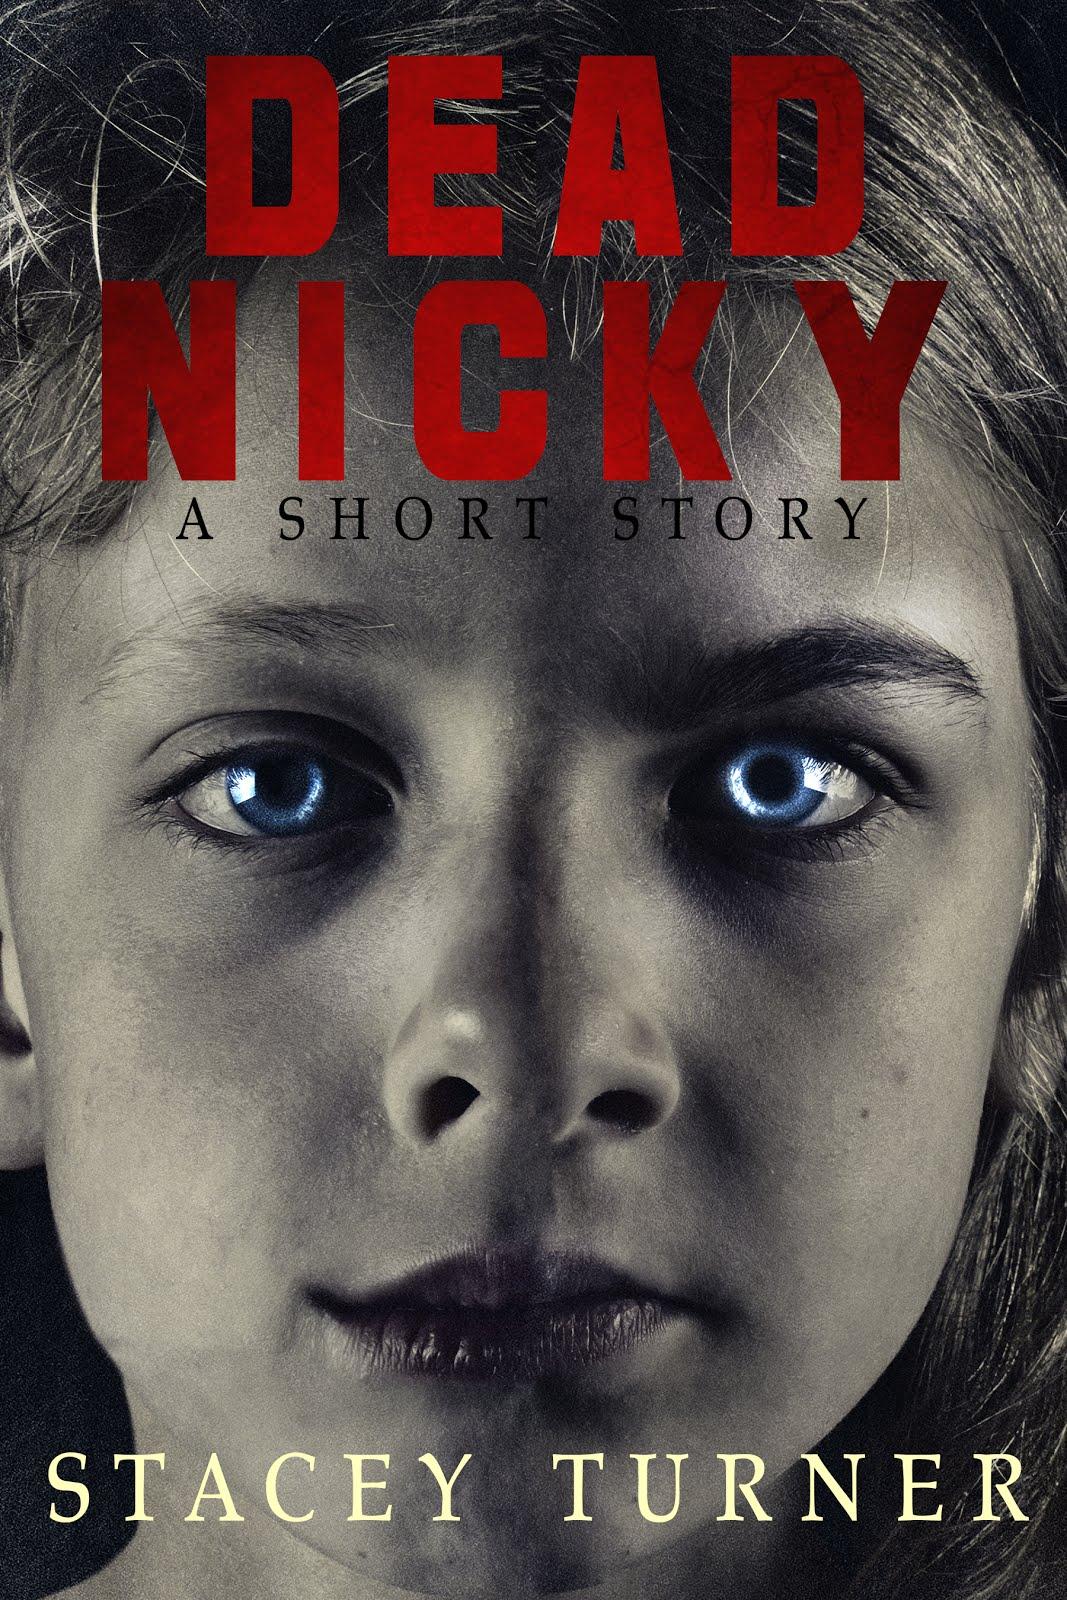 Dead Nicky